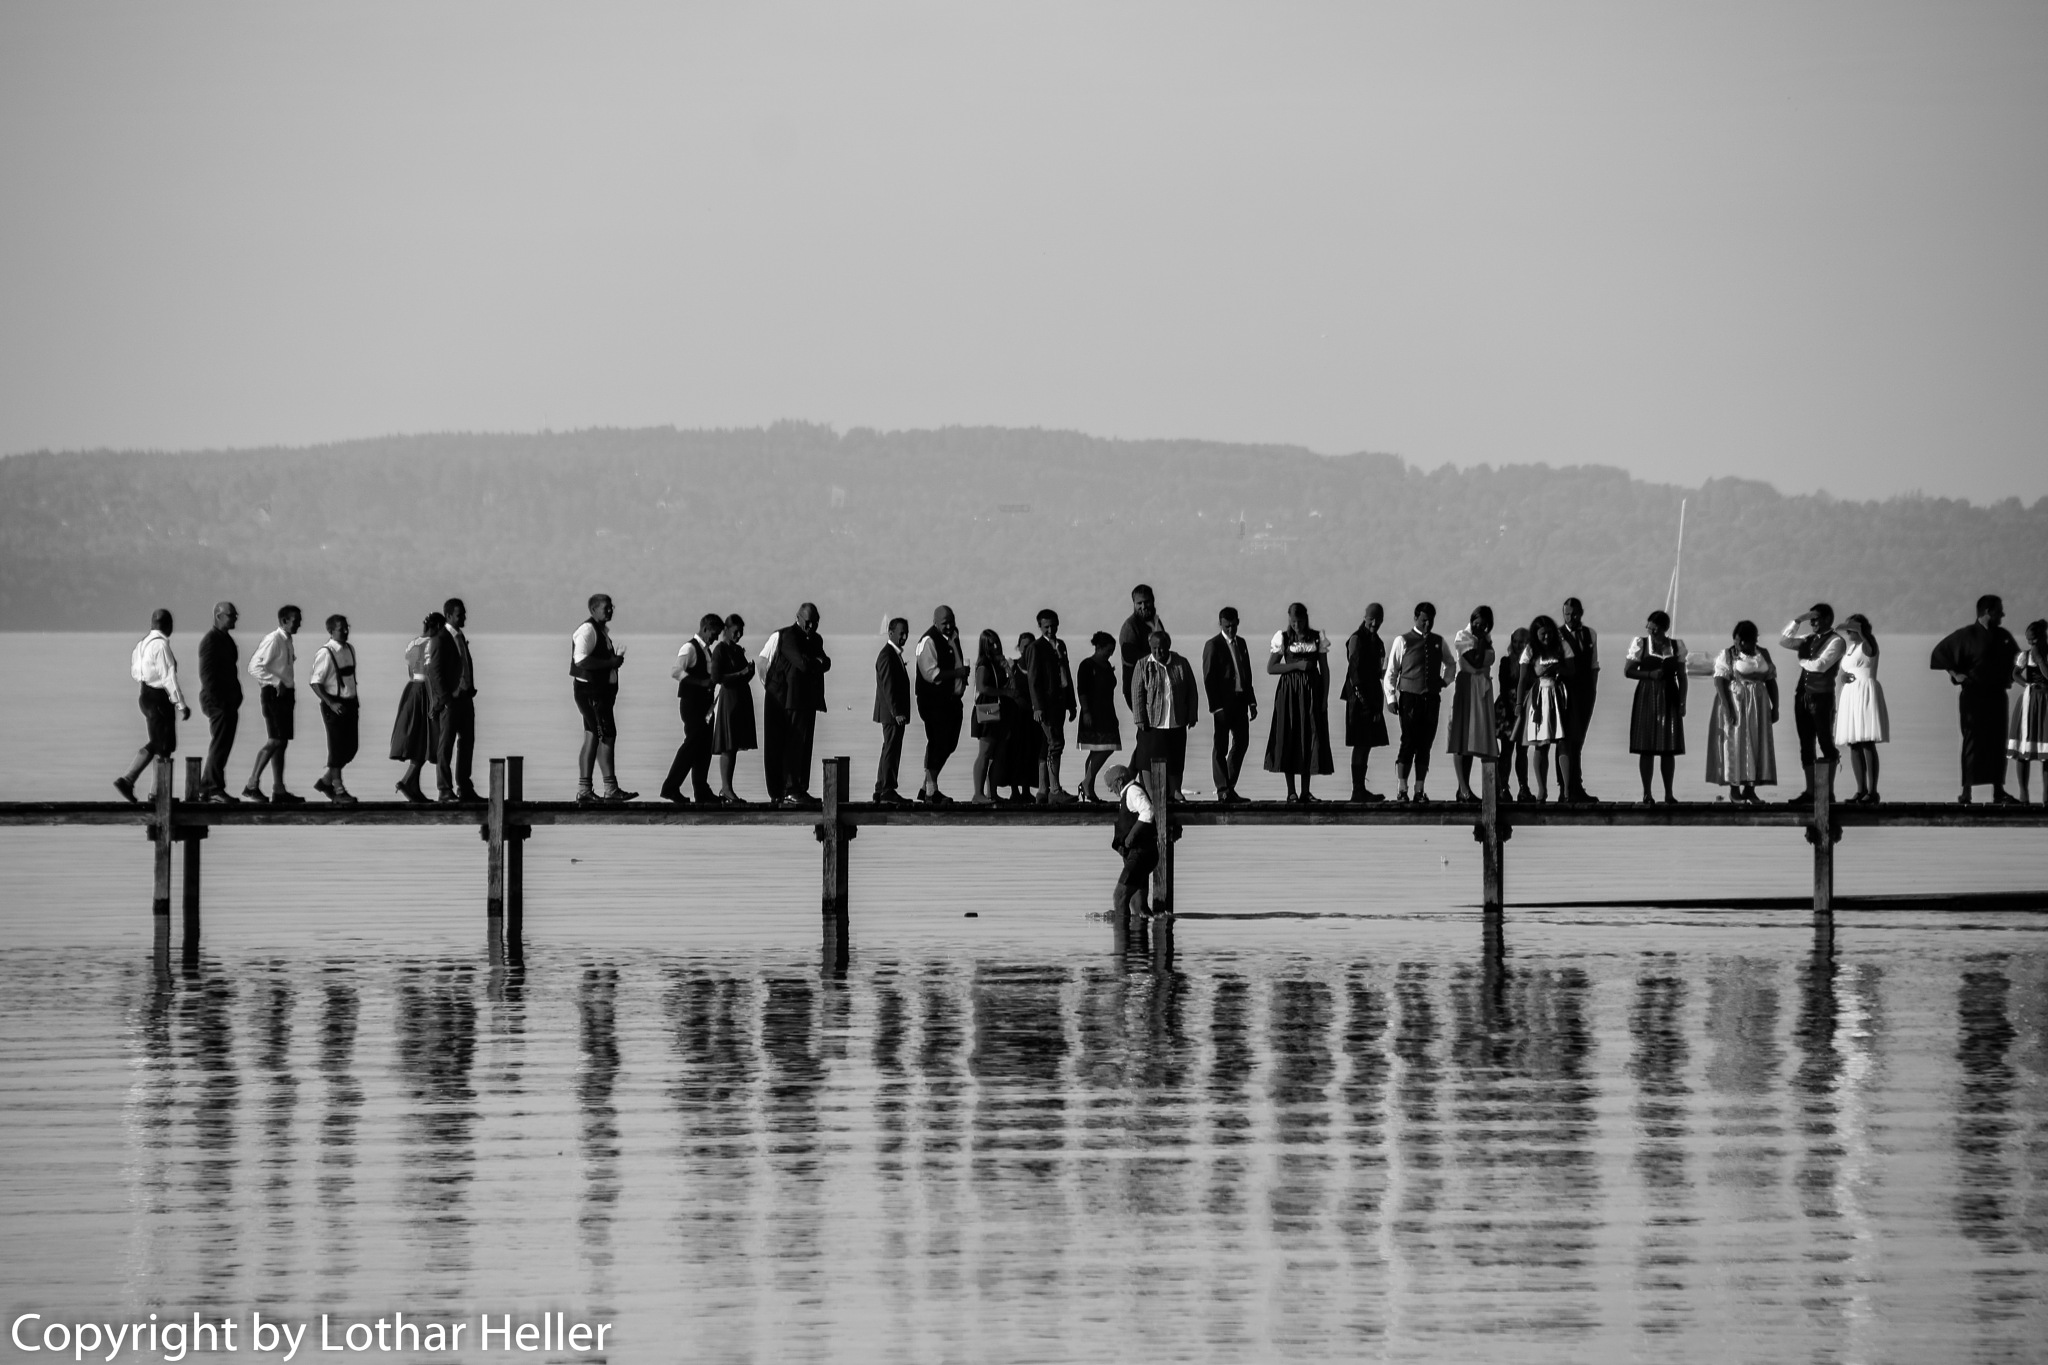 BW at the Lake by Lothar Heller